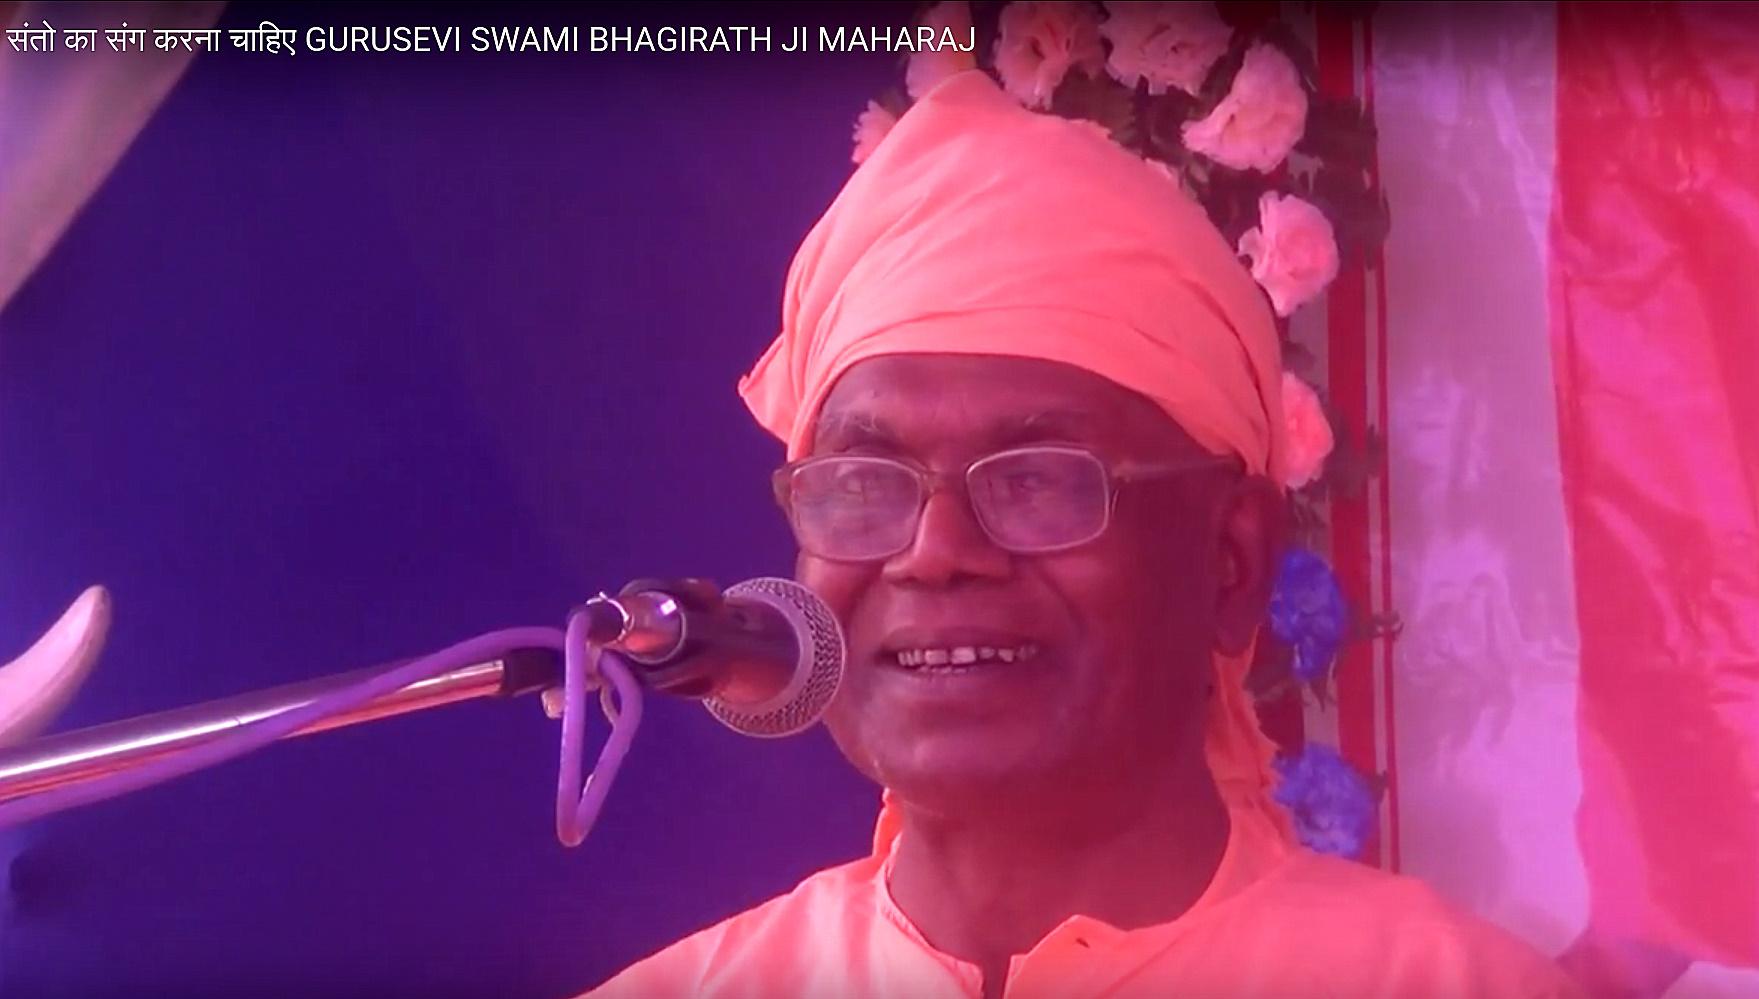 ShriBhagirathBabaSmiling